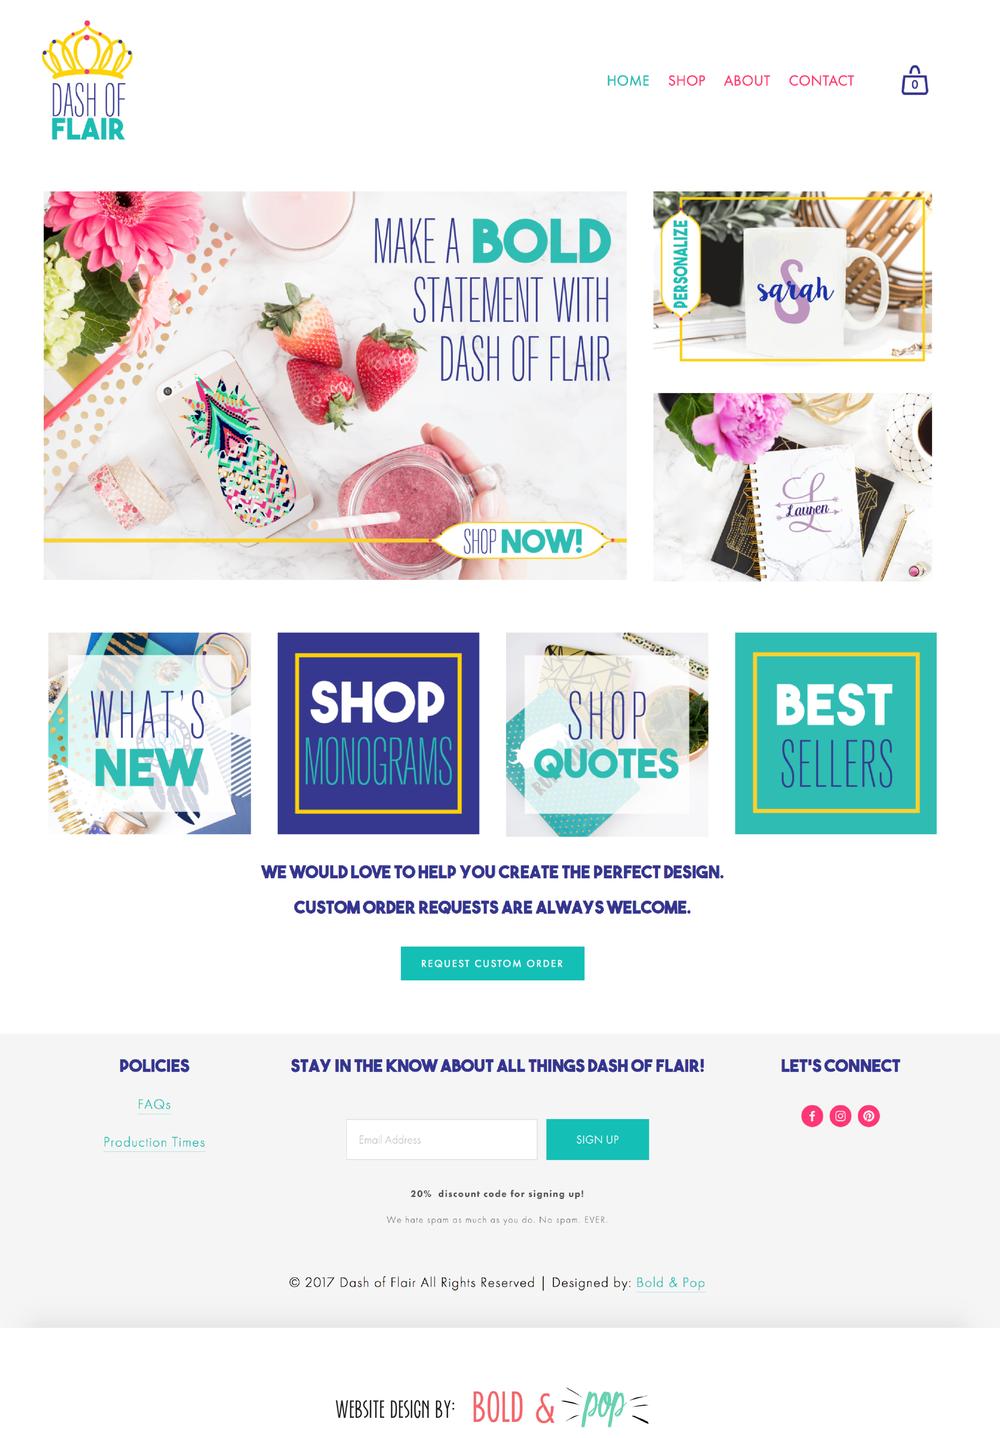 Bold+&+Pop+_+Dash+of+Flair+Branding+&+Website+Design.png